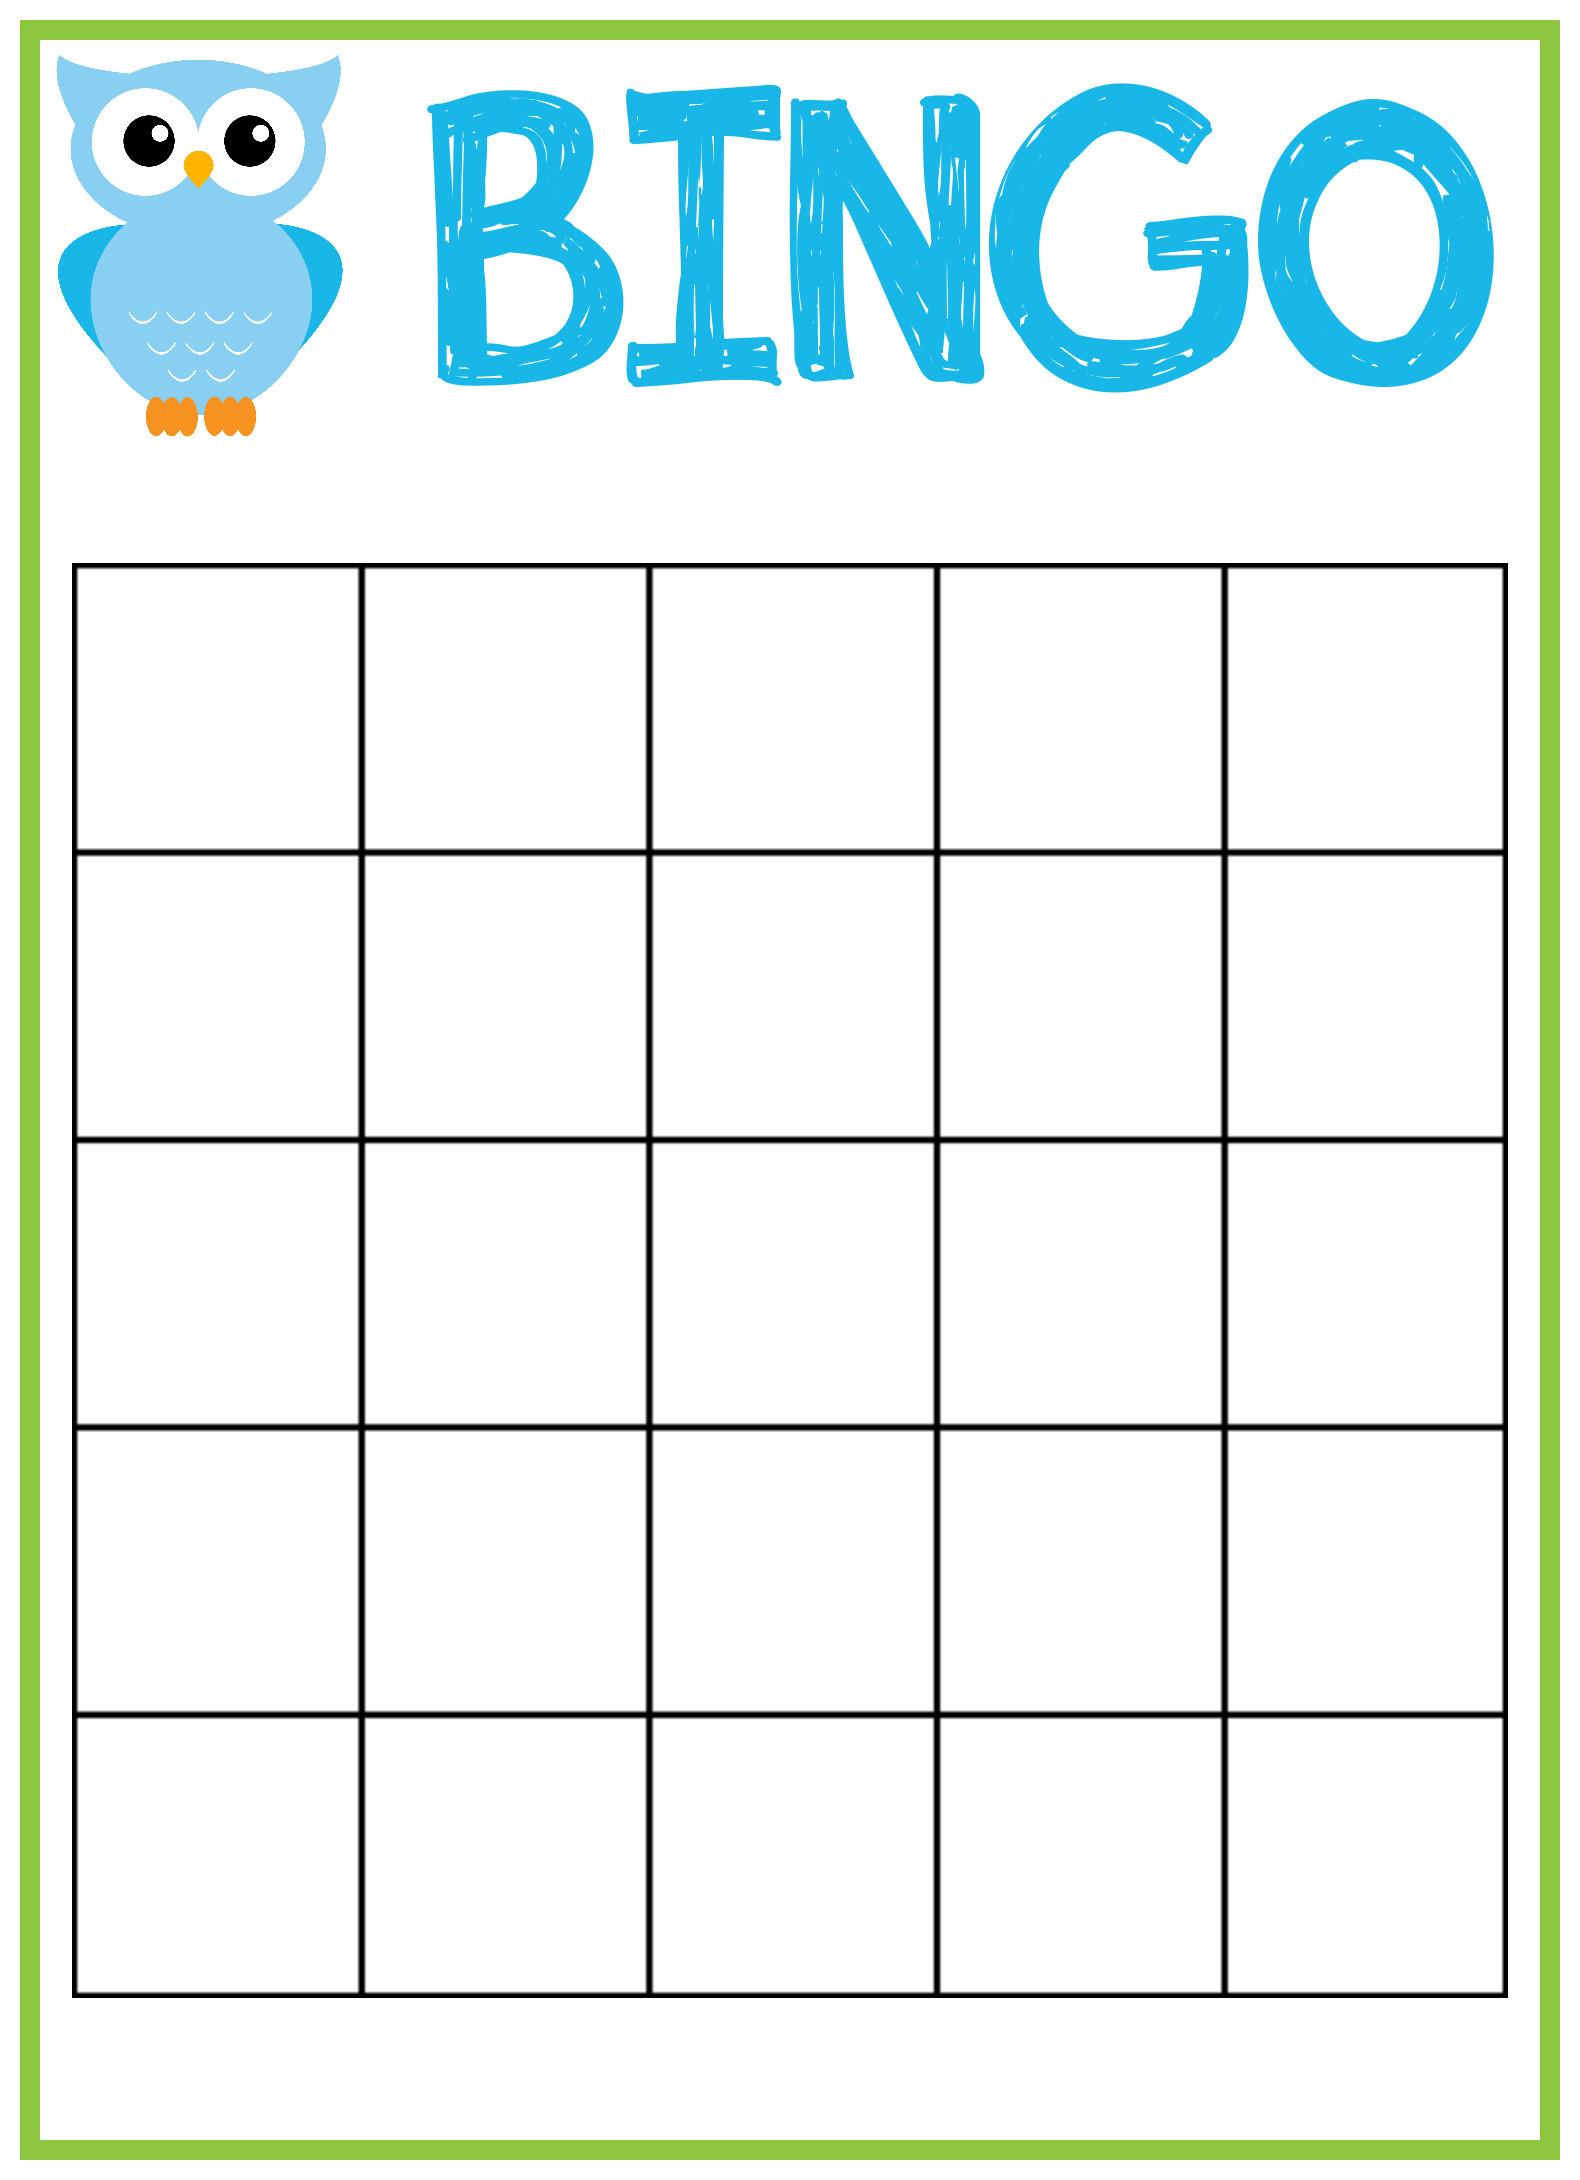 Free Bingo Card Template Owl Baby Shower Bingo Cards Crazy Little Projects